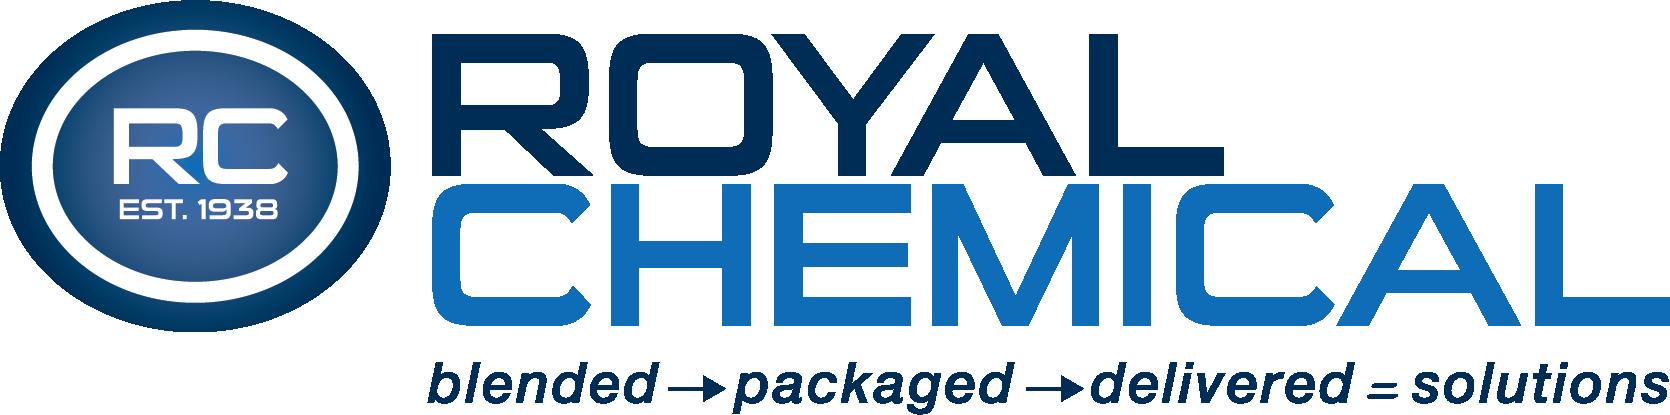 RoyalChemical_2017